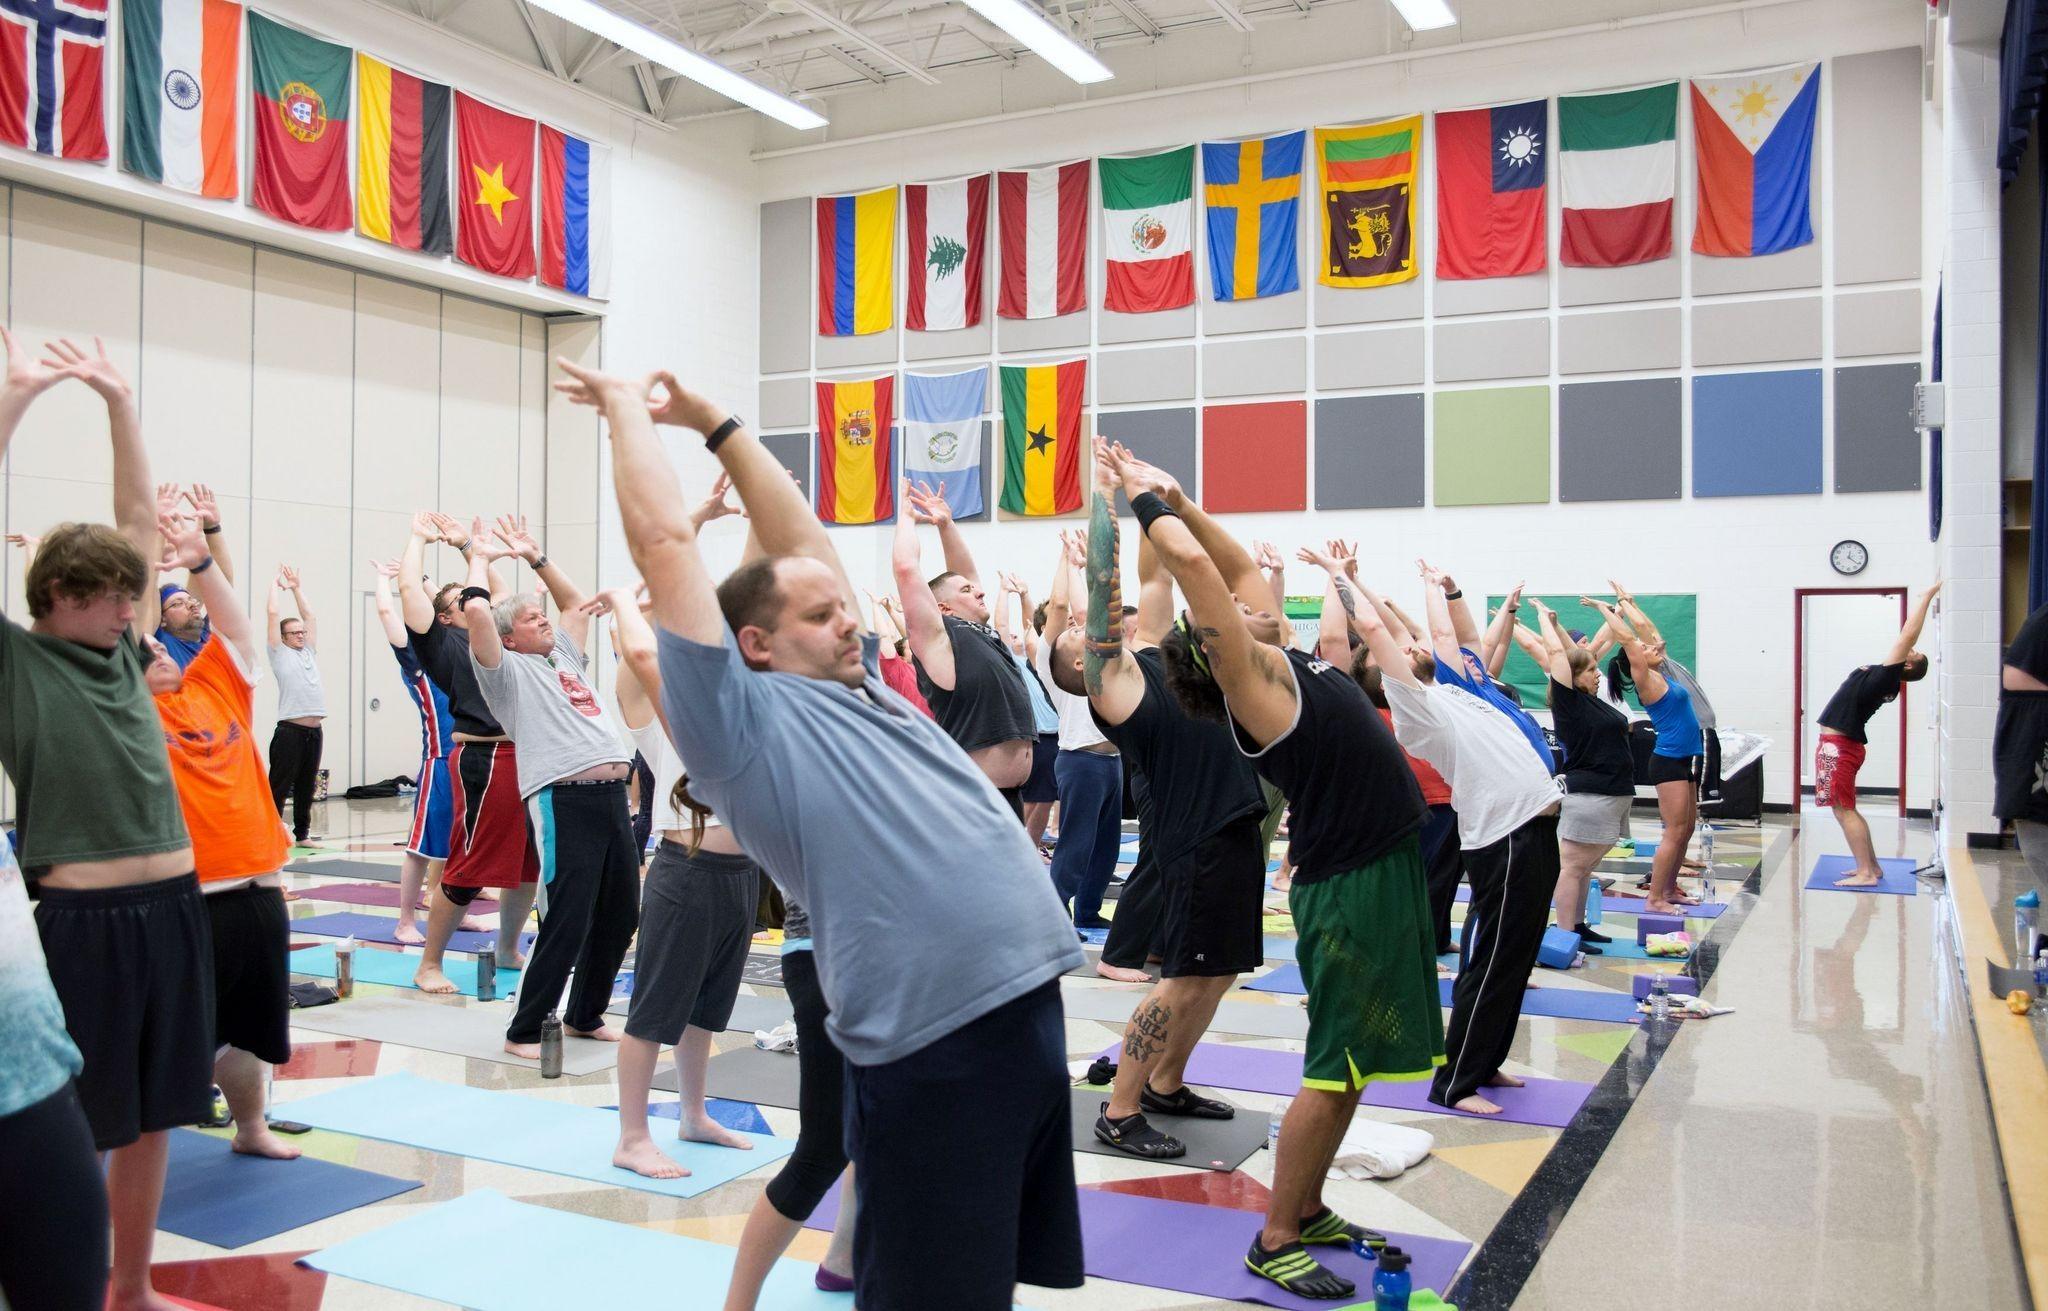 Diamond Dallas Page Teaches Workshop Gives Speech At Ddp Yoga Seminar Mlive Com